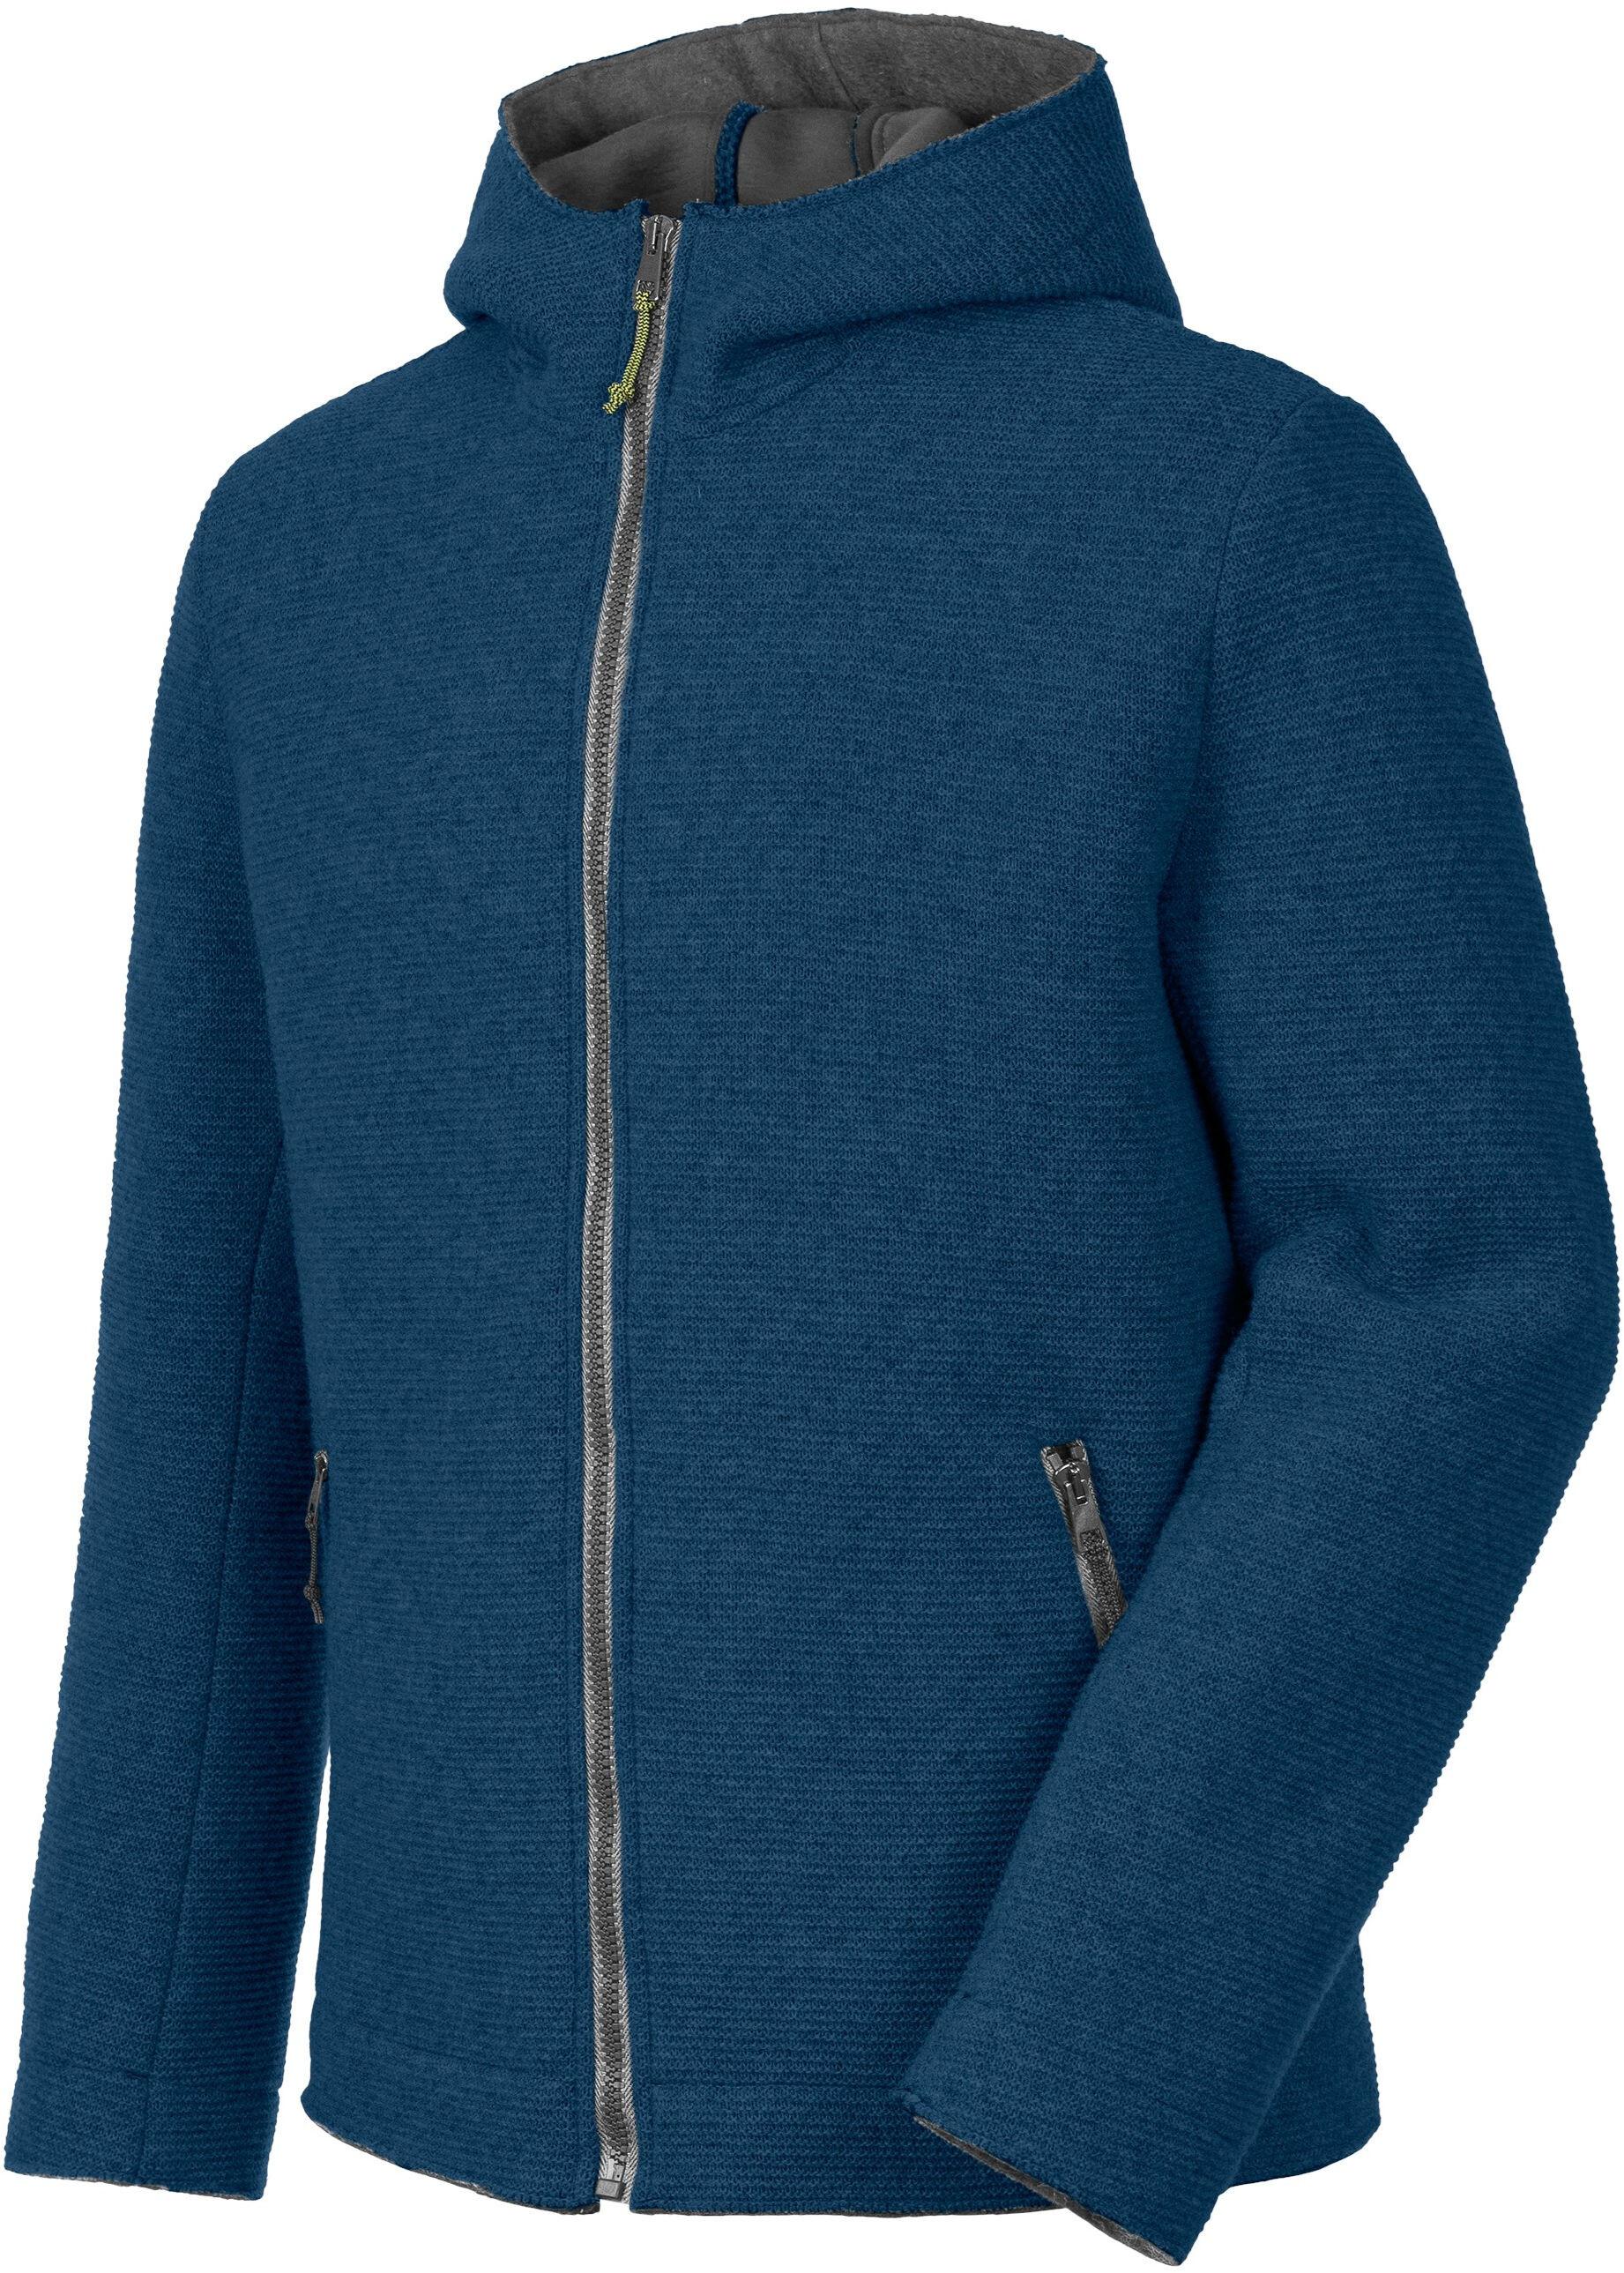 Salewa Sarner 2l Wool Full Zip Hoody Men Poseidon Tendencies Sweater Green Zipper Olive S